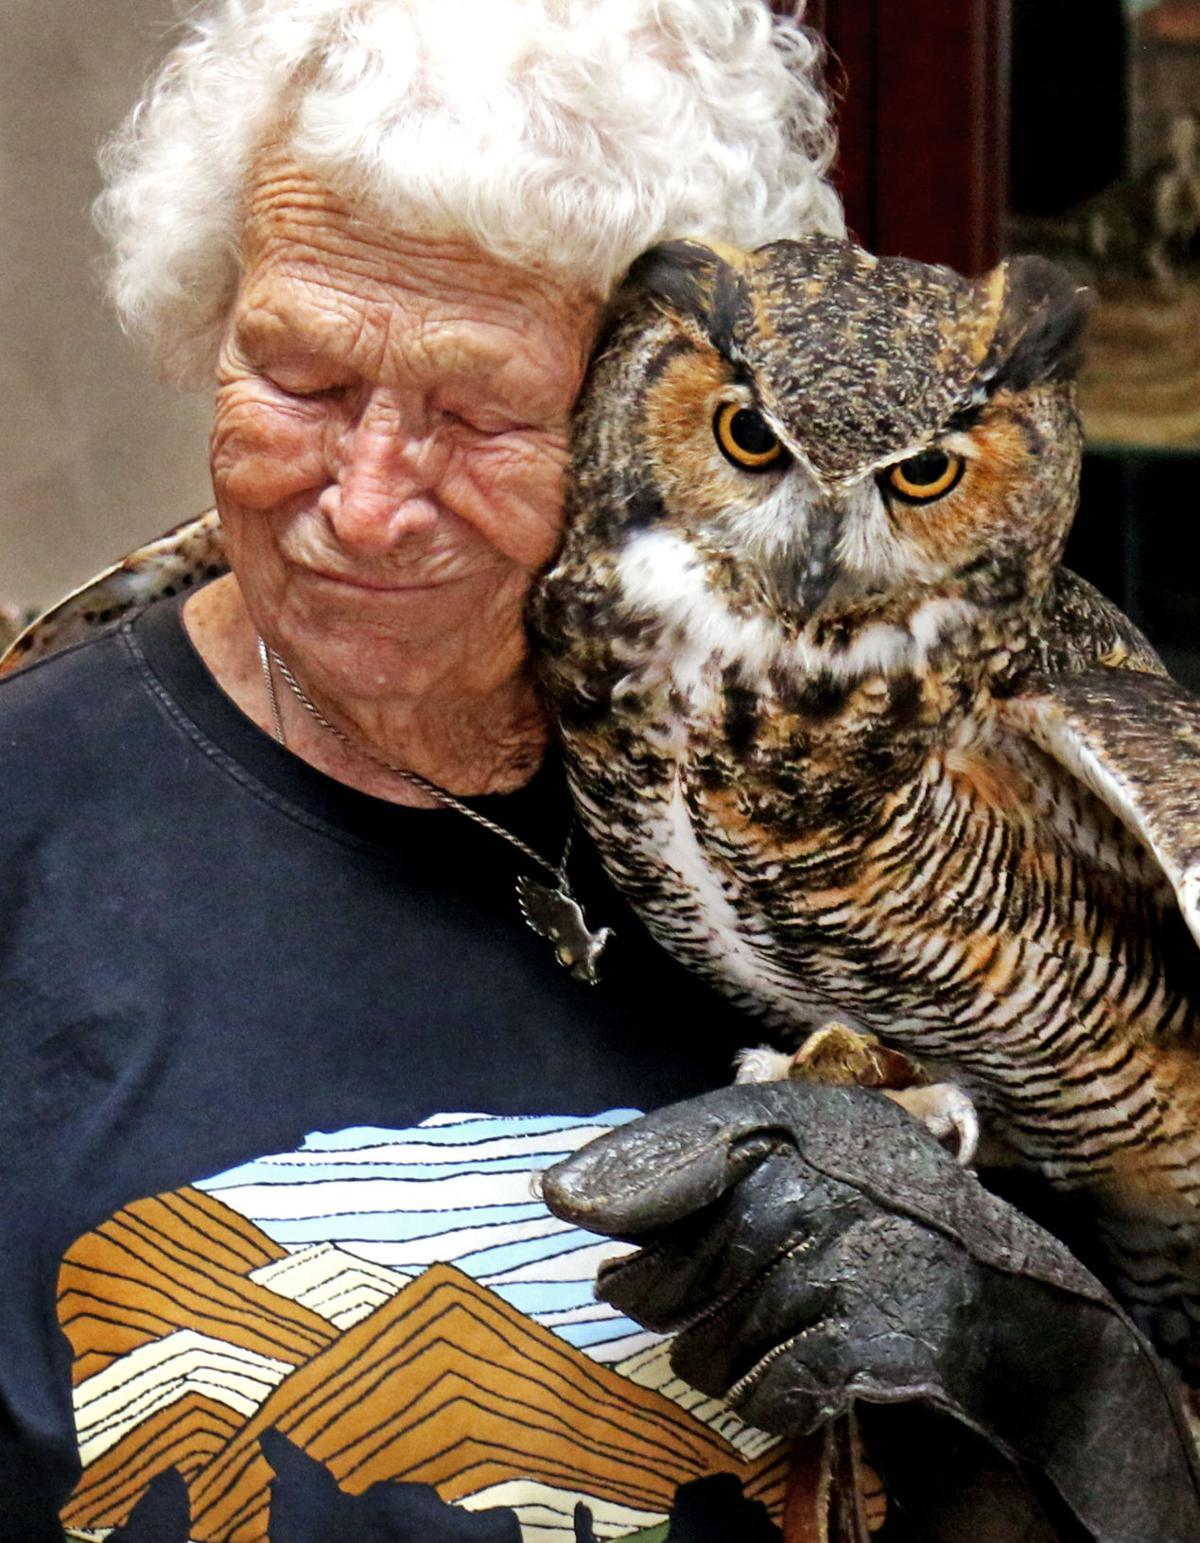 042419 STN Owl lady at DPNC 627.JPG